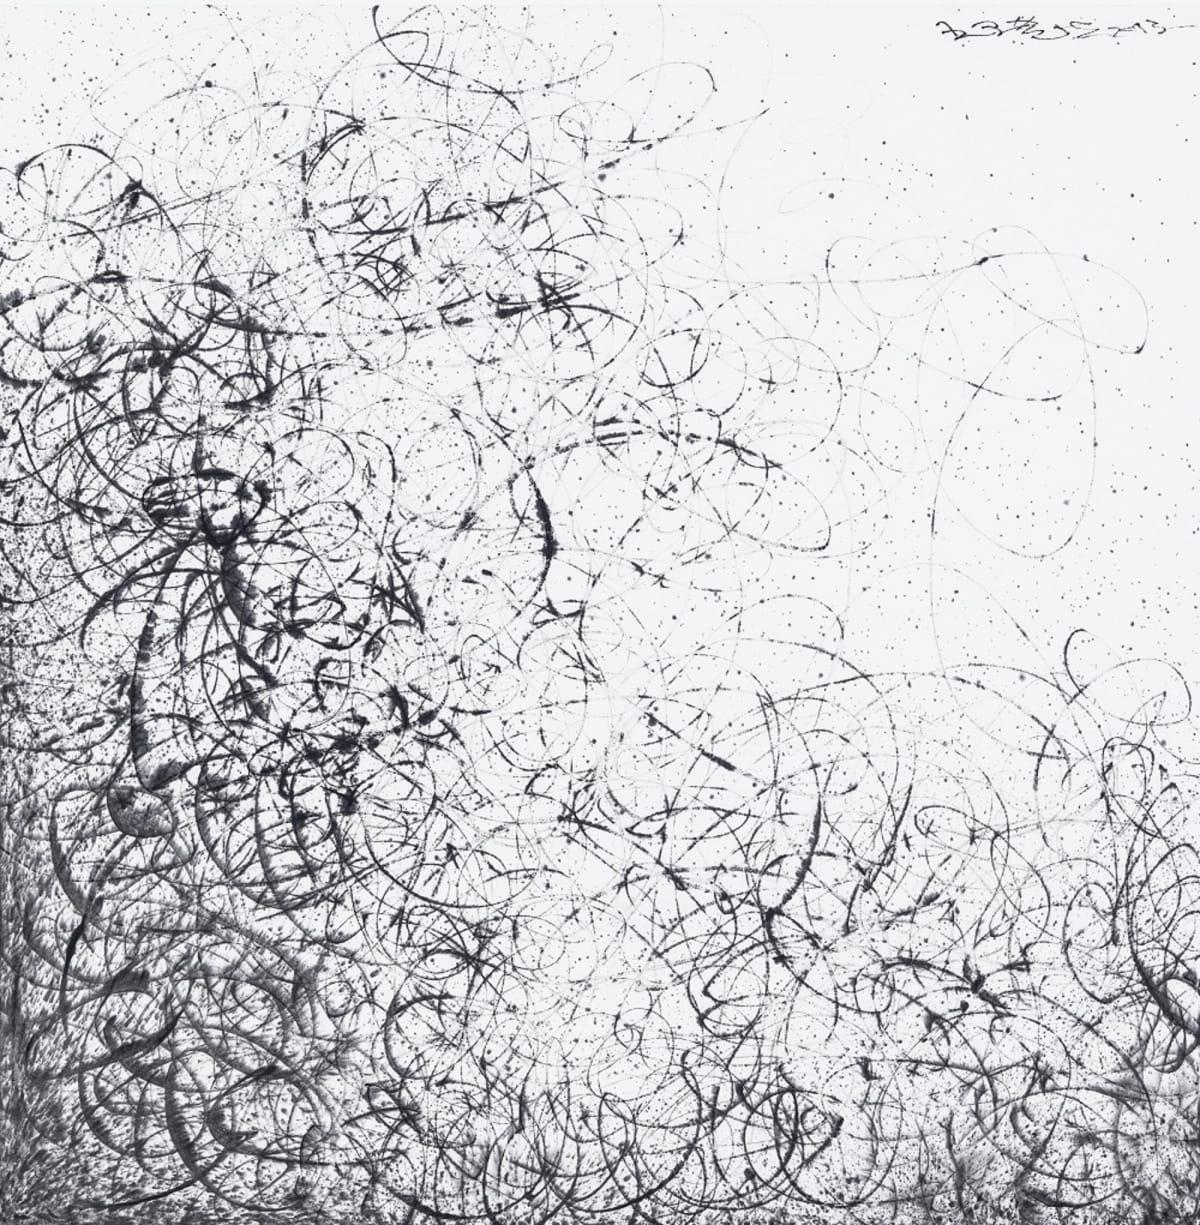 Wang Huangsheng 王璜生, Moving Vision 1323 游‧象 1323, 2013